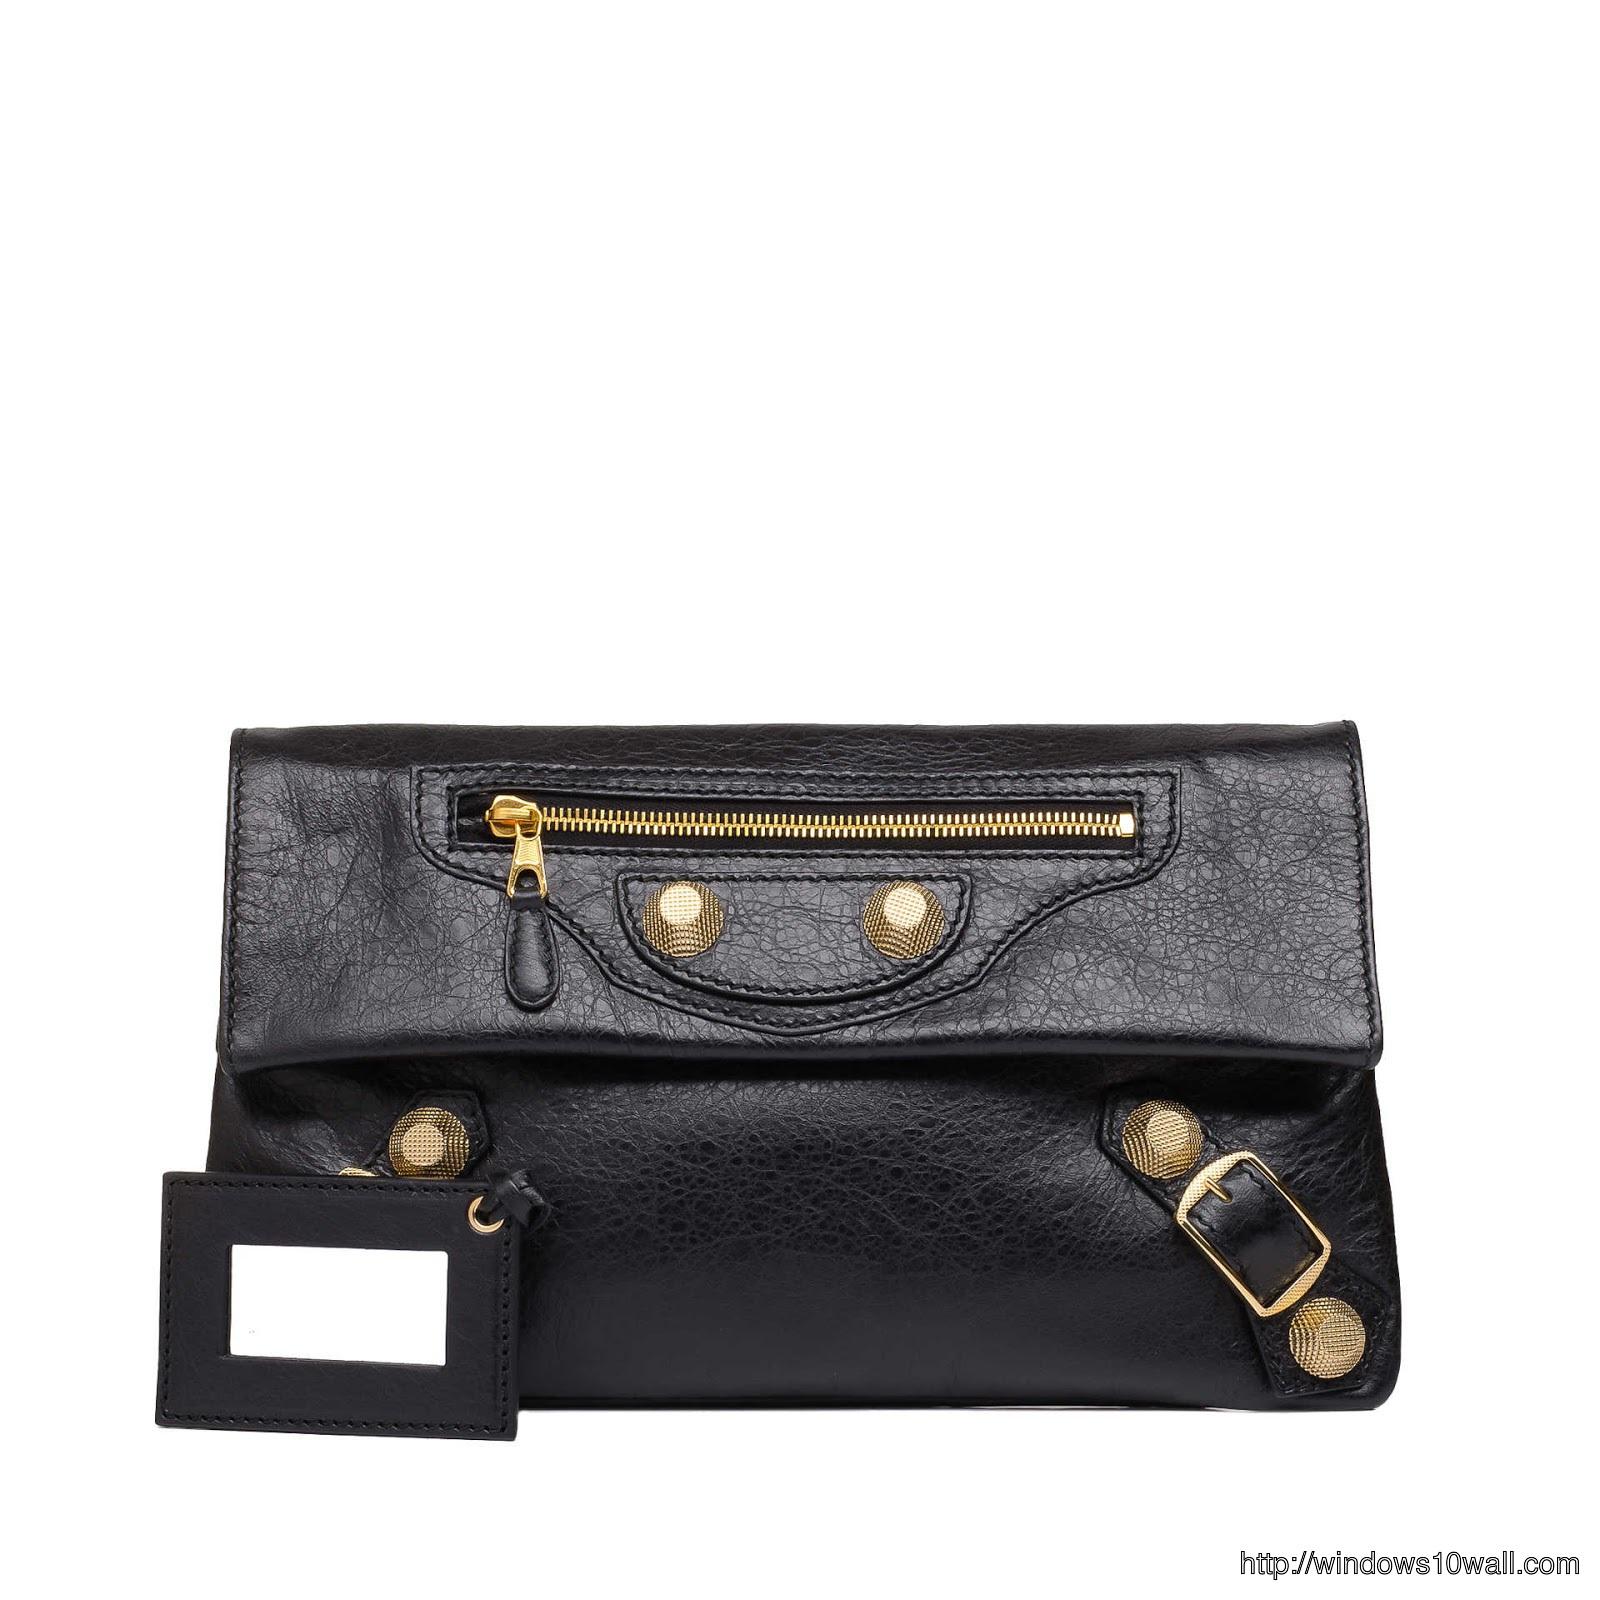 black-balenciaga-envelope-bag-2014-background-wallpaper